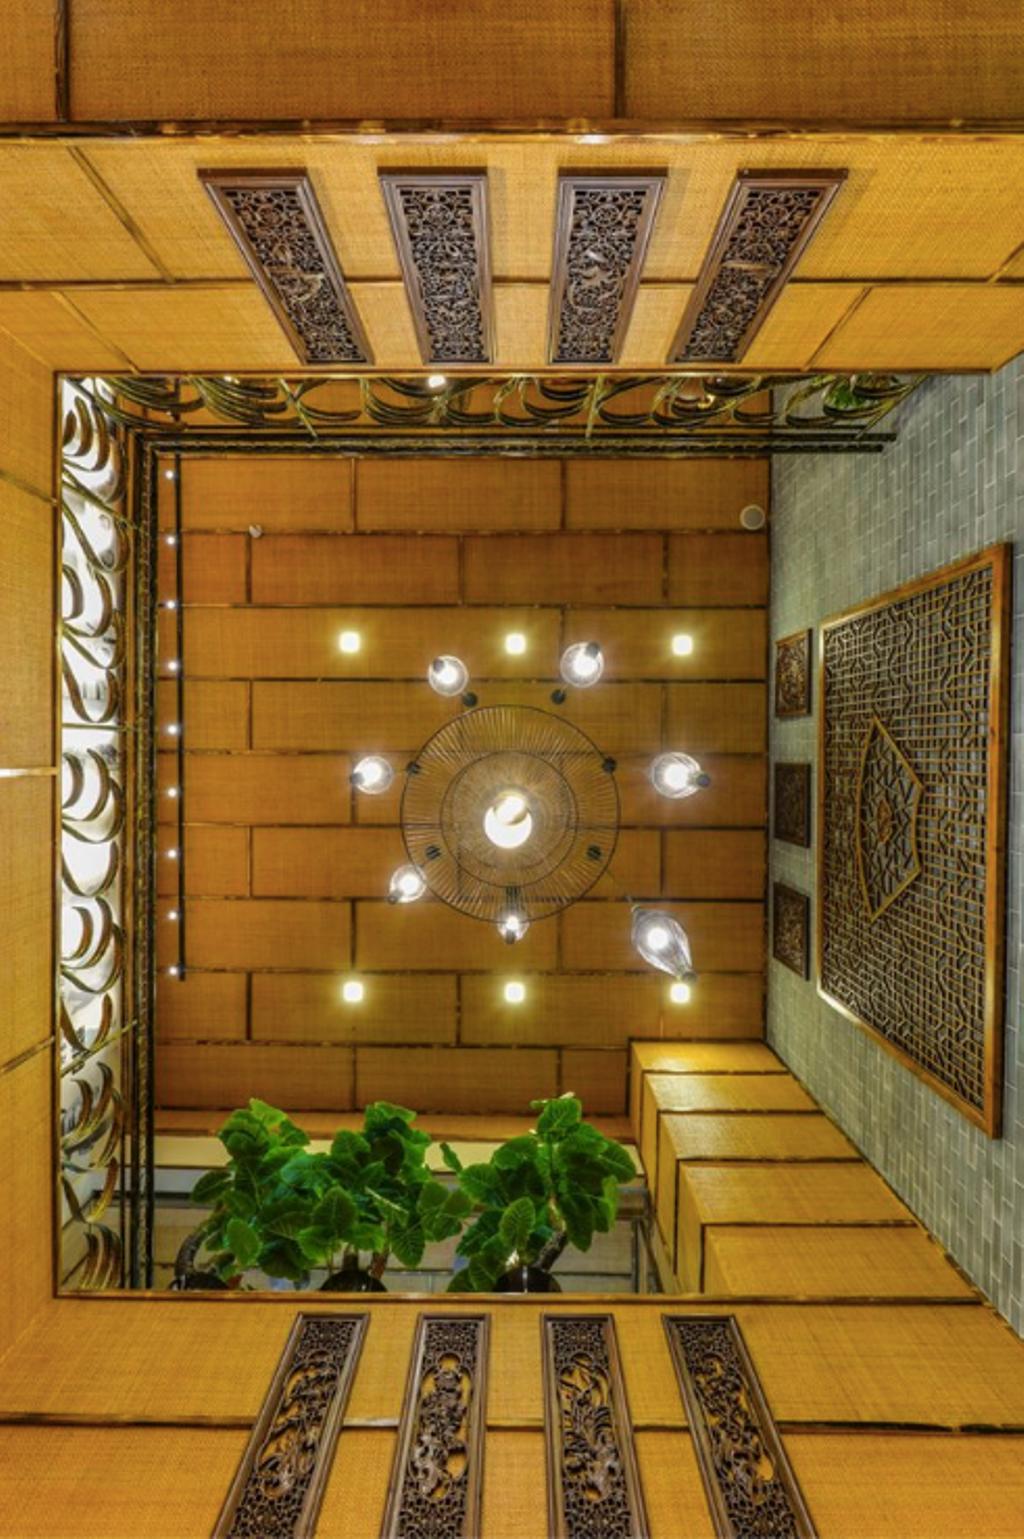 Shun De Gong Restaurant, Bukit Bintang, Commercial, Interior Designer, GI Design Sdn Bhd, Industrial, Traditional